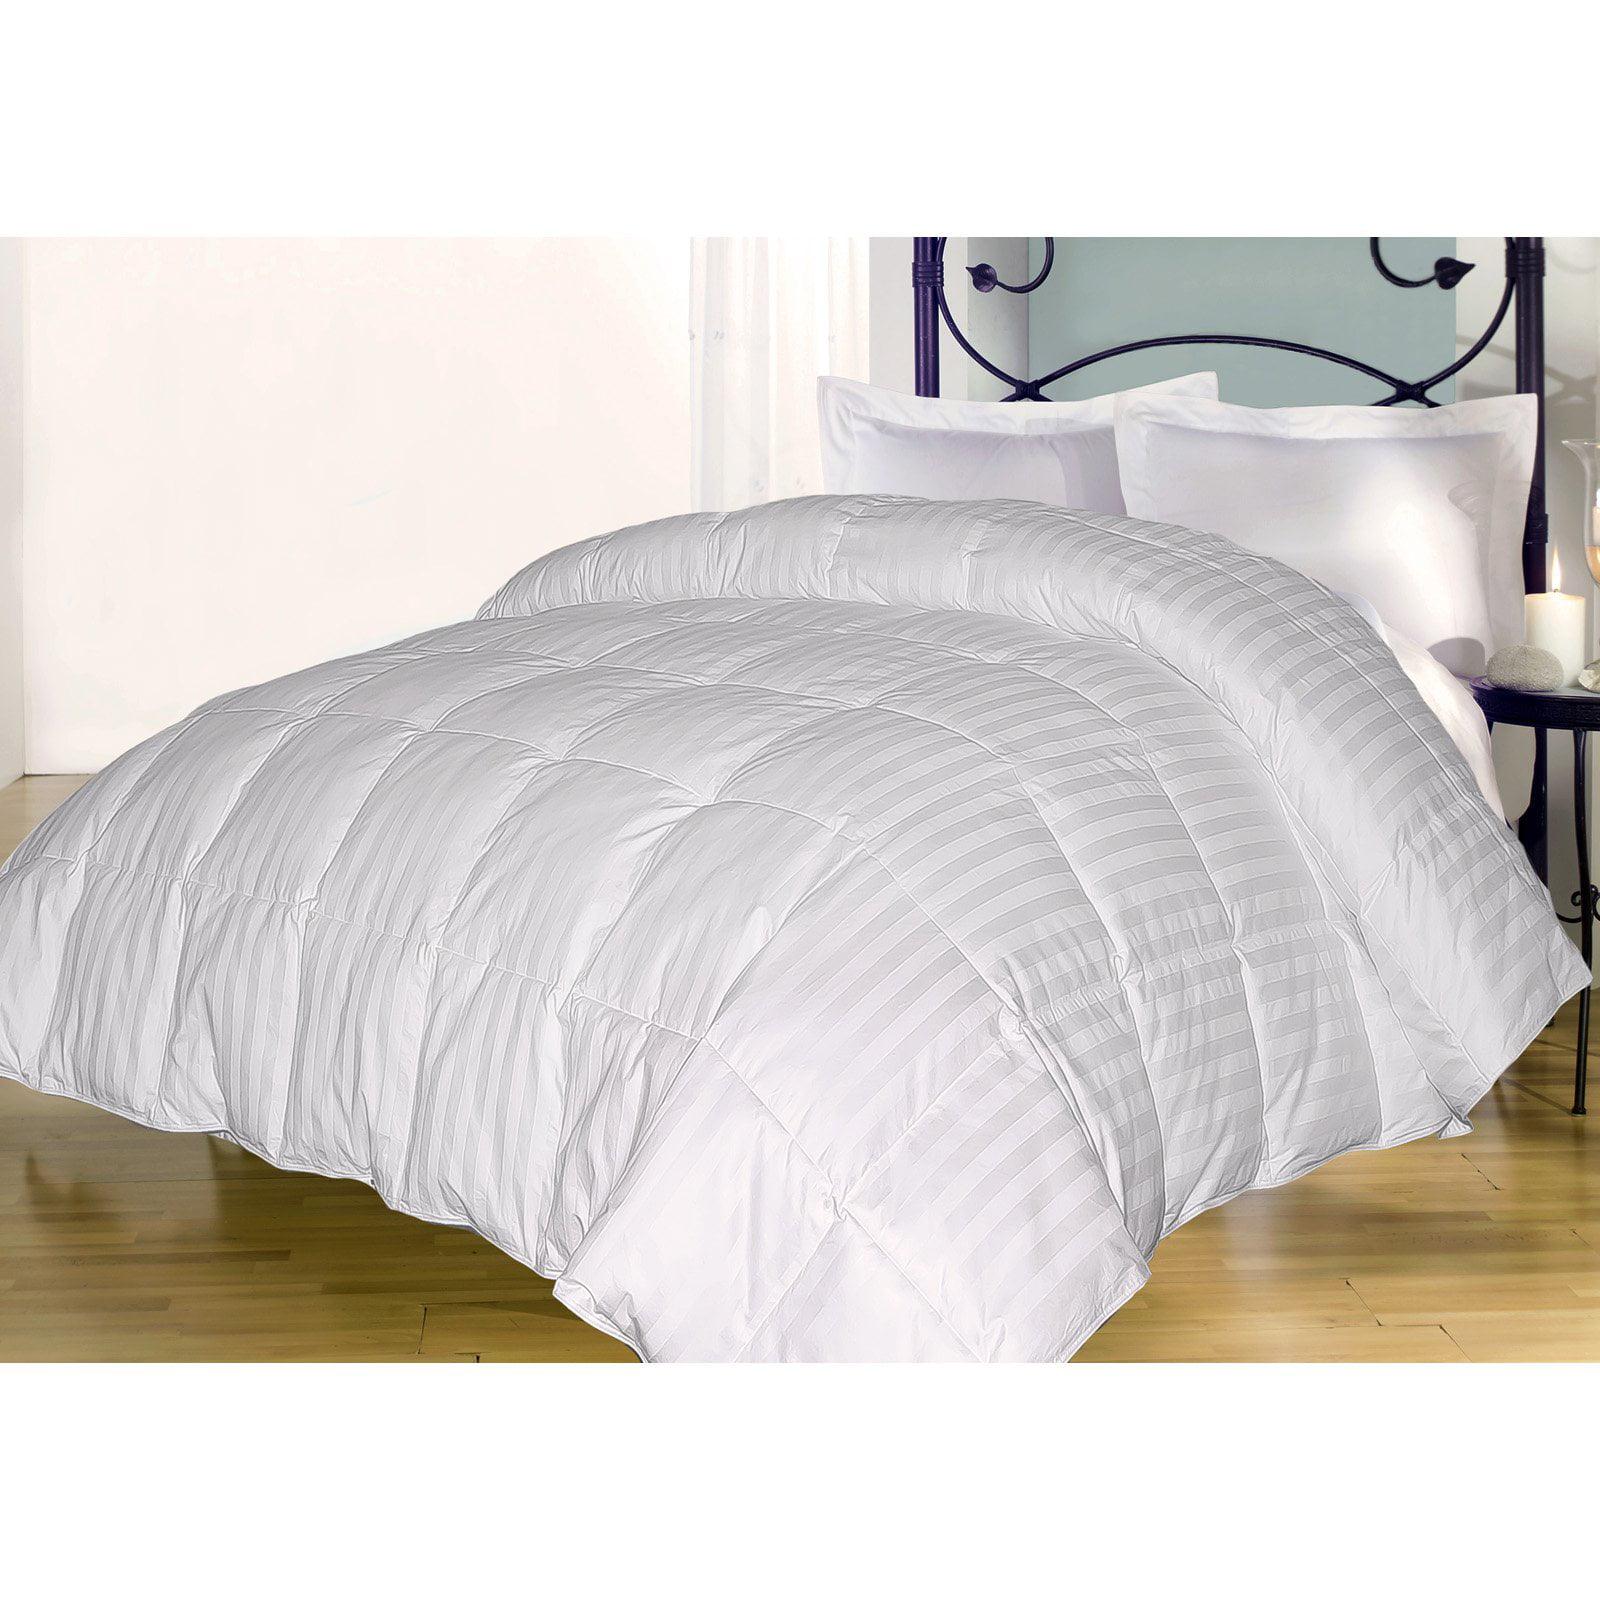 350 damask stripe down alternative comforter walmart com